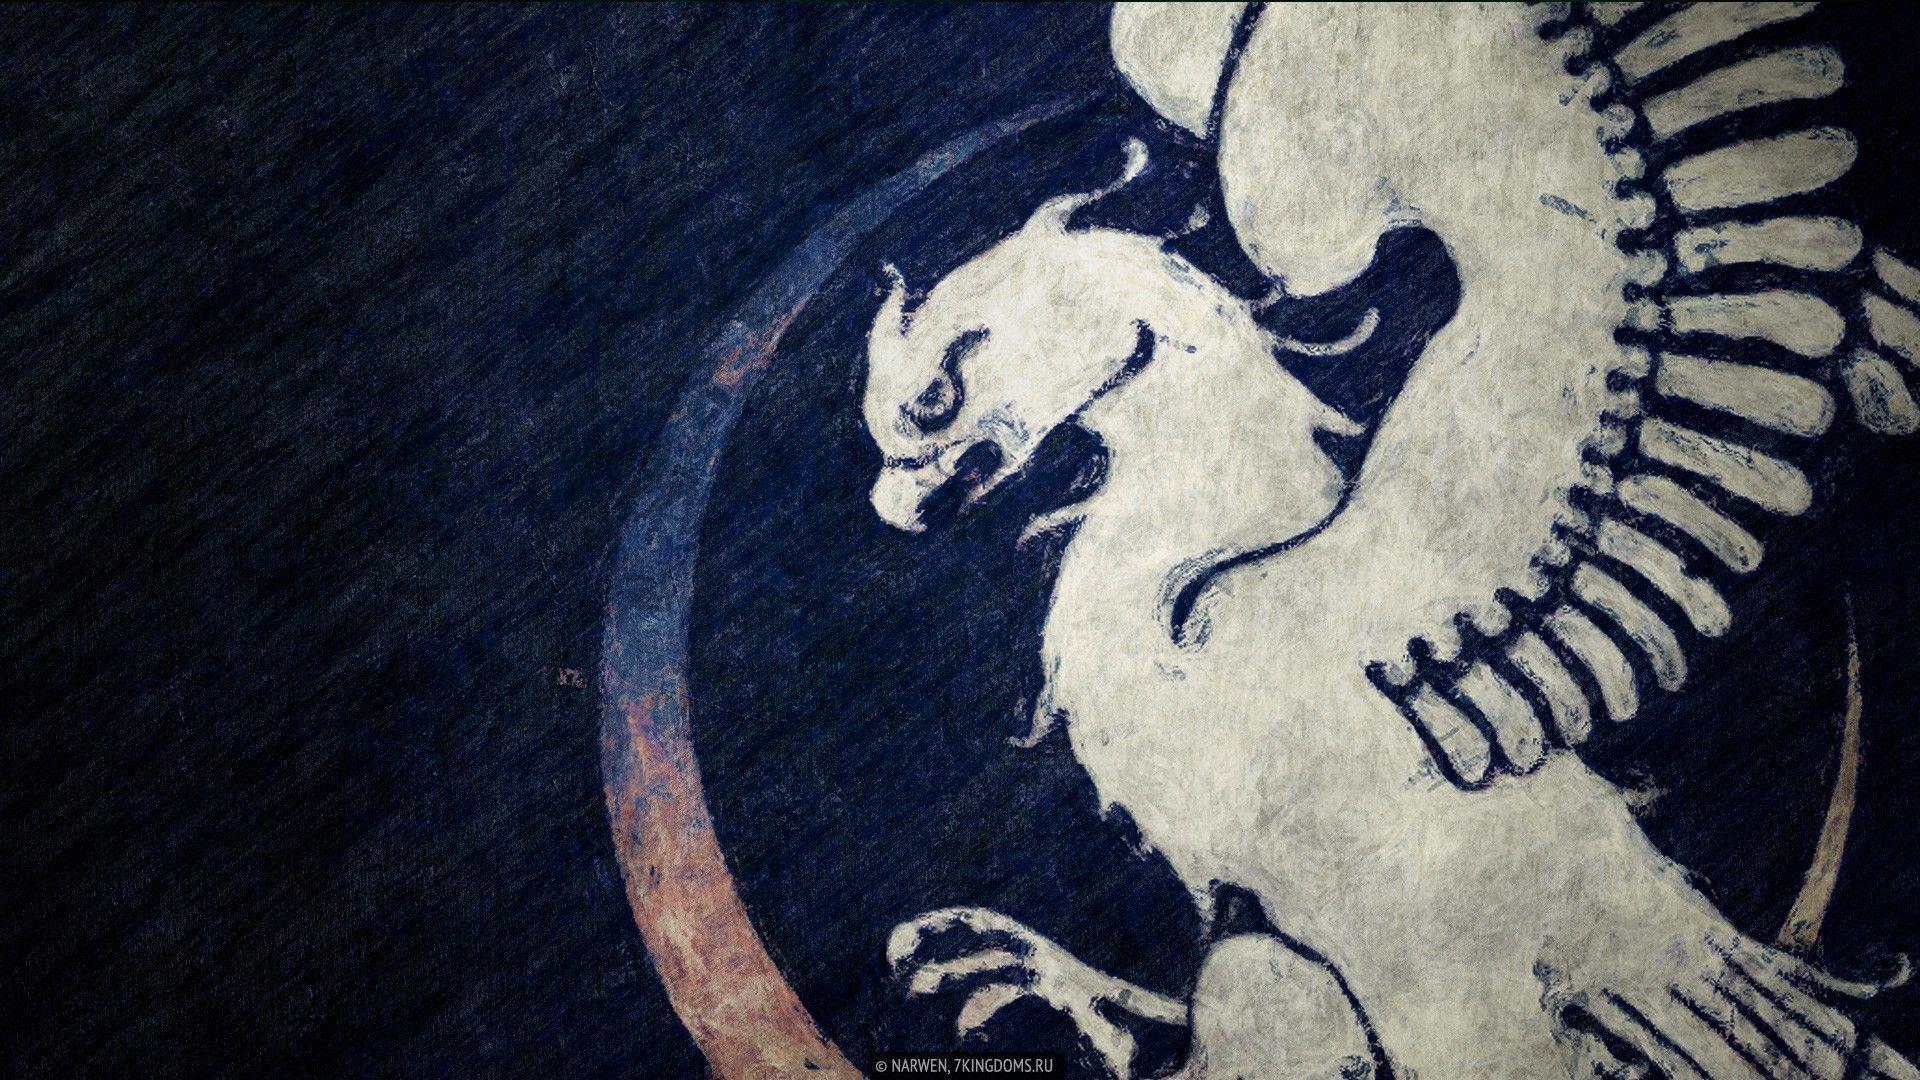 House Targaryen Game Of Thrones Hd Wallpaper | Cool Designs